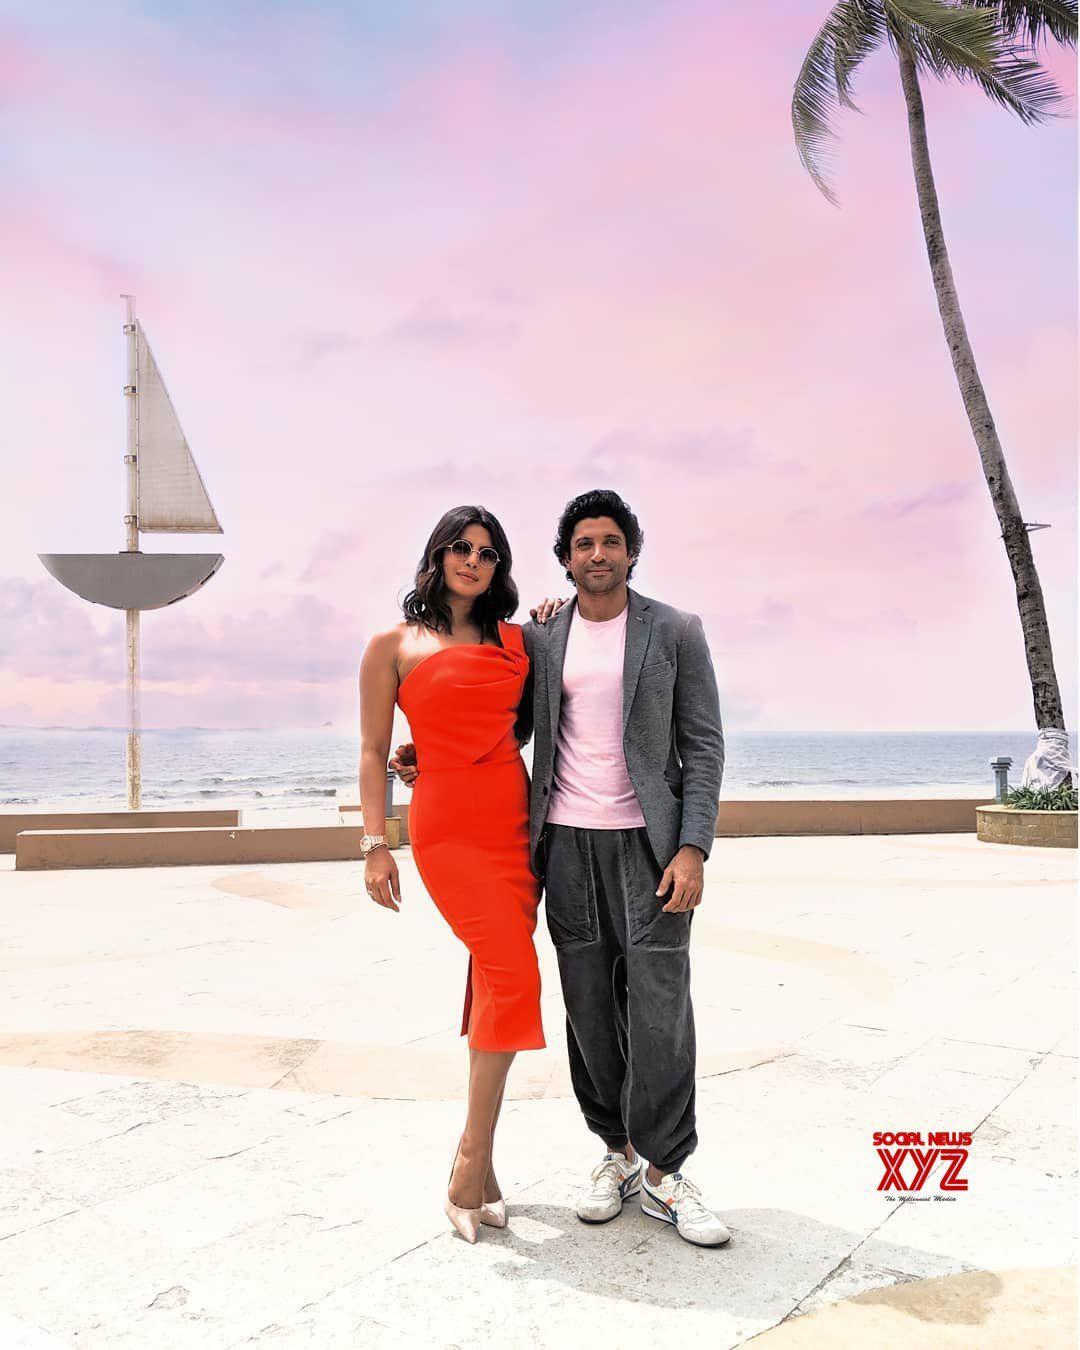 Actress Priyanka Chopra New Stills From The Sky Is Pink Movie Promotions Social News Xyz Actress Priyanka Chopra Priyanka Chopra Pink Movies